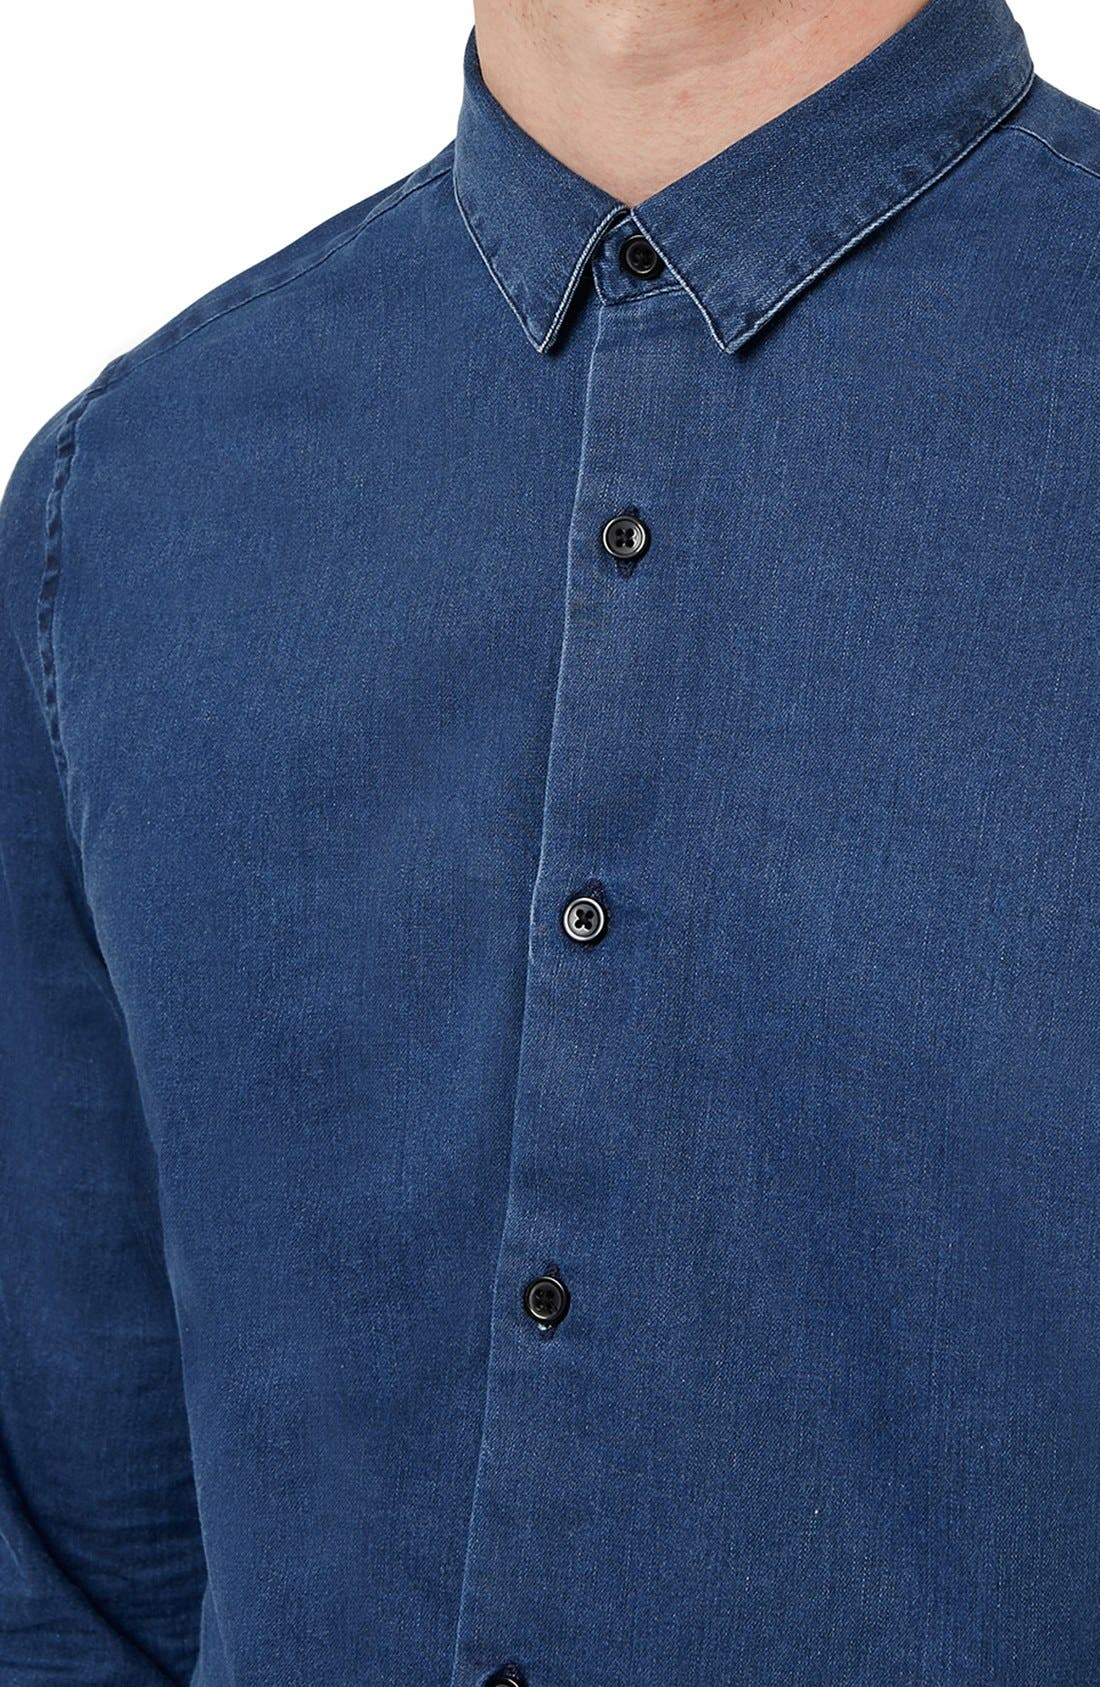 TOPMAN, Denim Shirt, Alternate thumbnail 3, color, 401